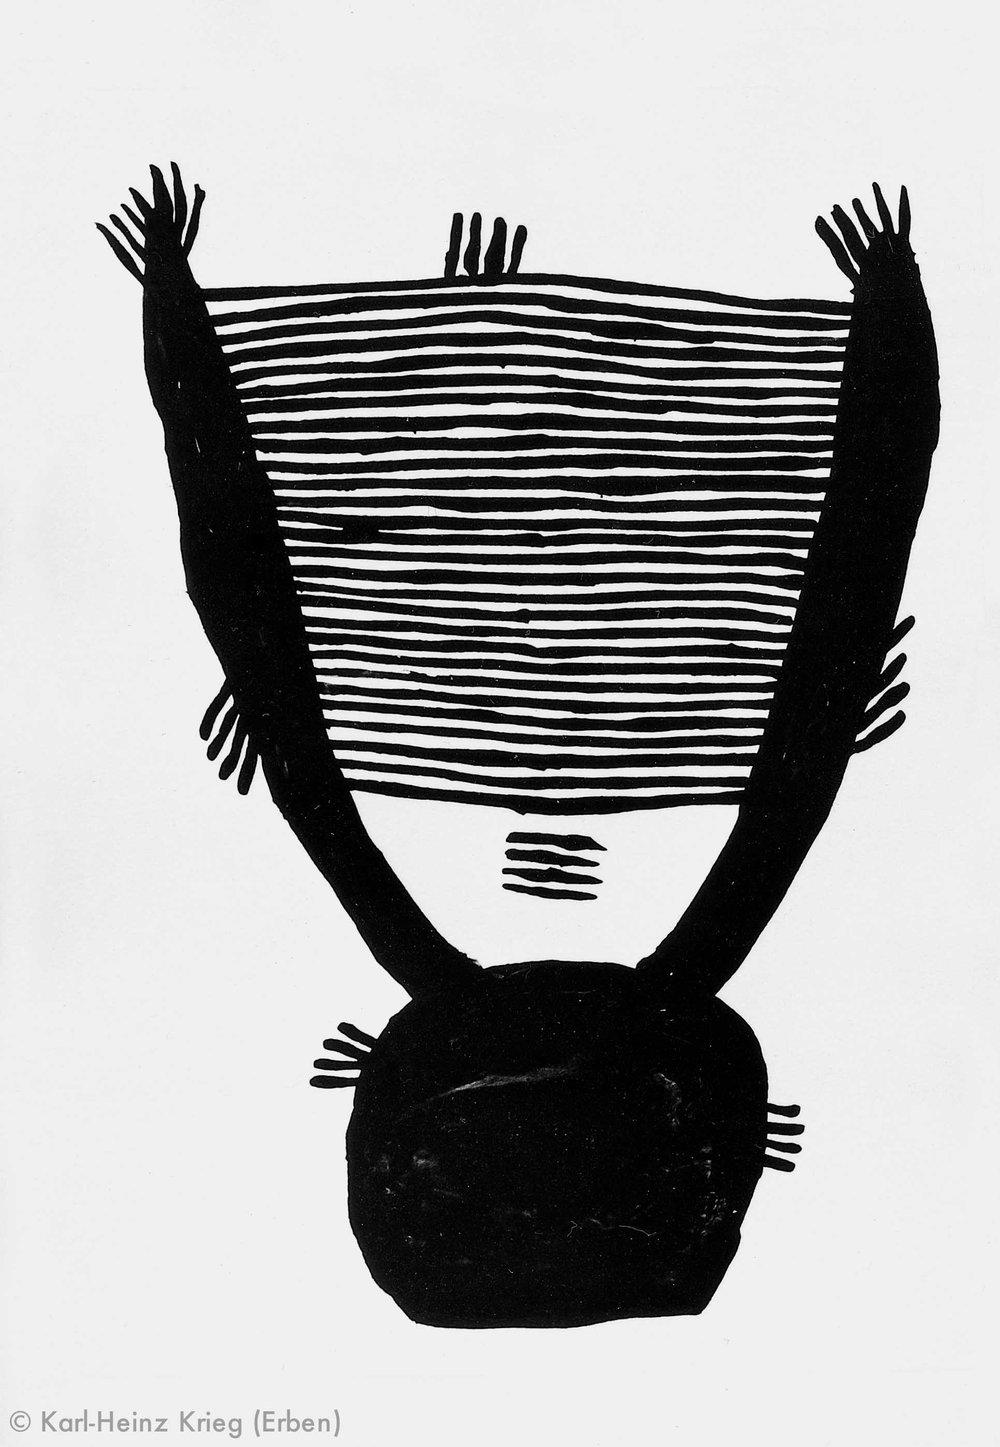 Akoi Zoumanigi Königi, 1996 Acryl/Papier, grundiert 28,1 x 20,7 cm Werknr. 38-1996/18